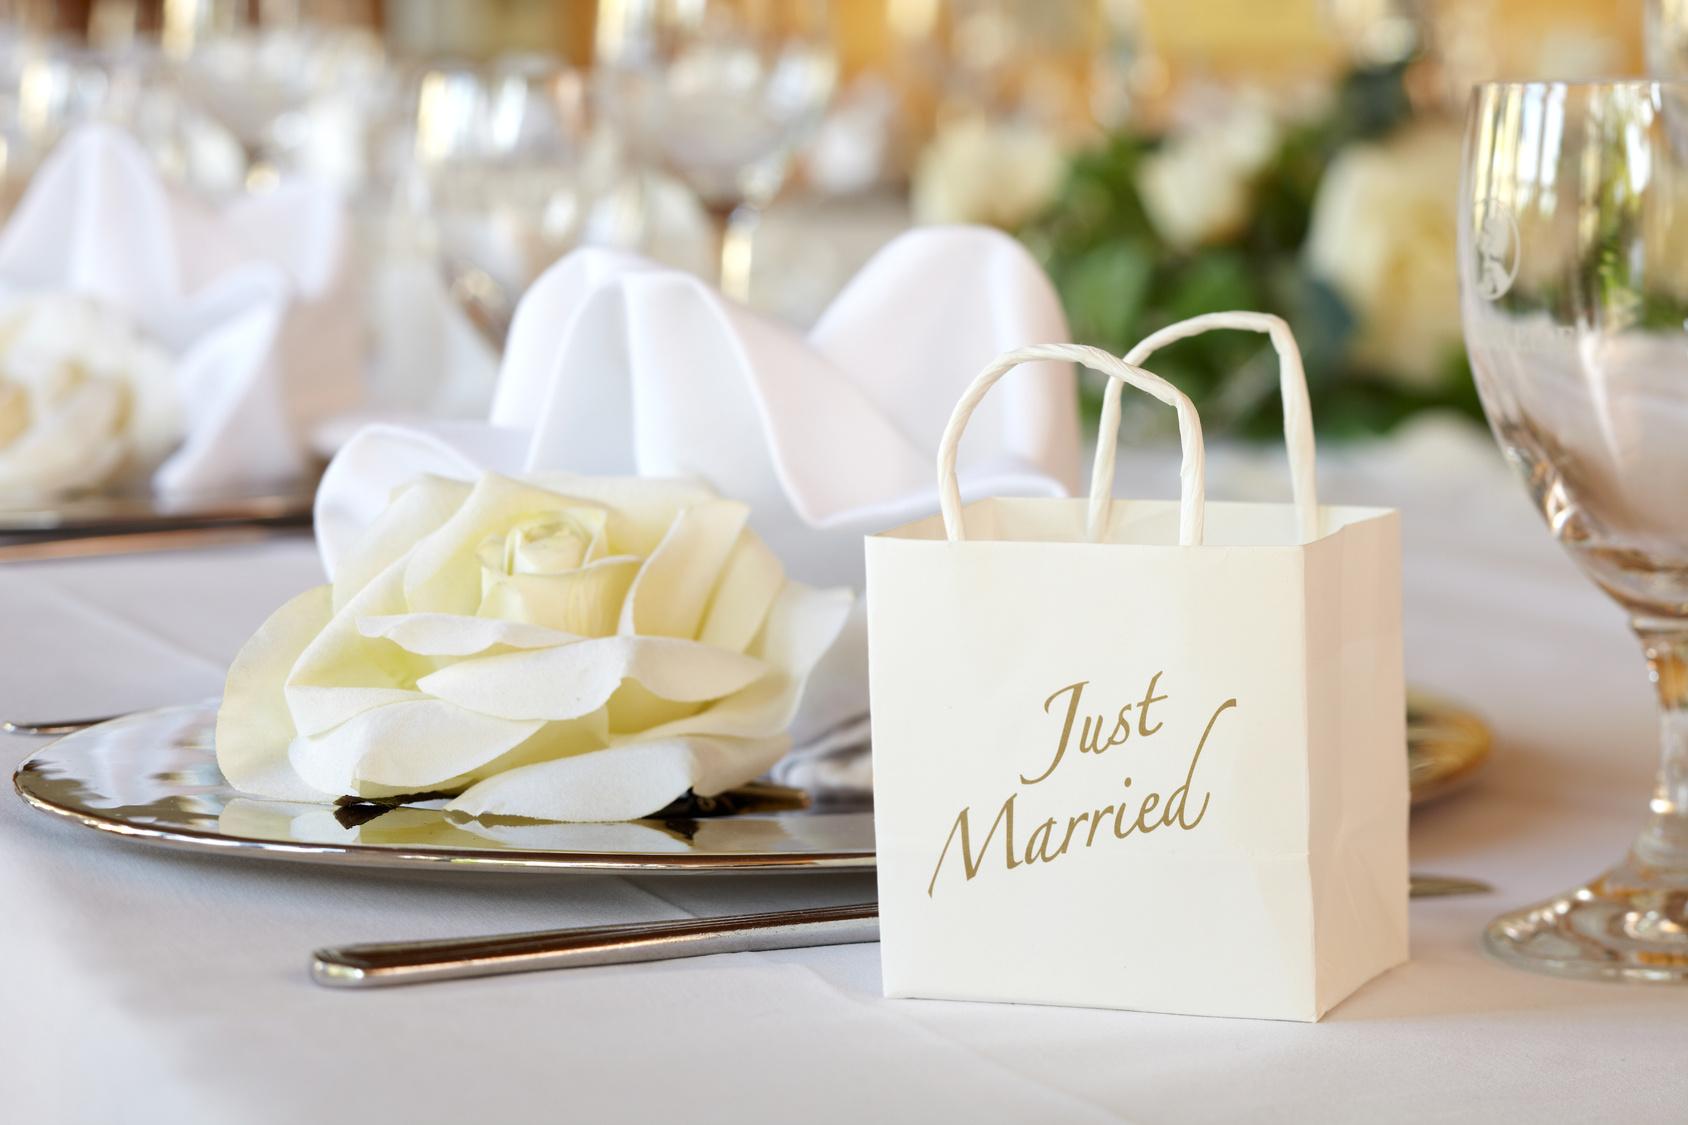 Contact pour mariage